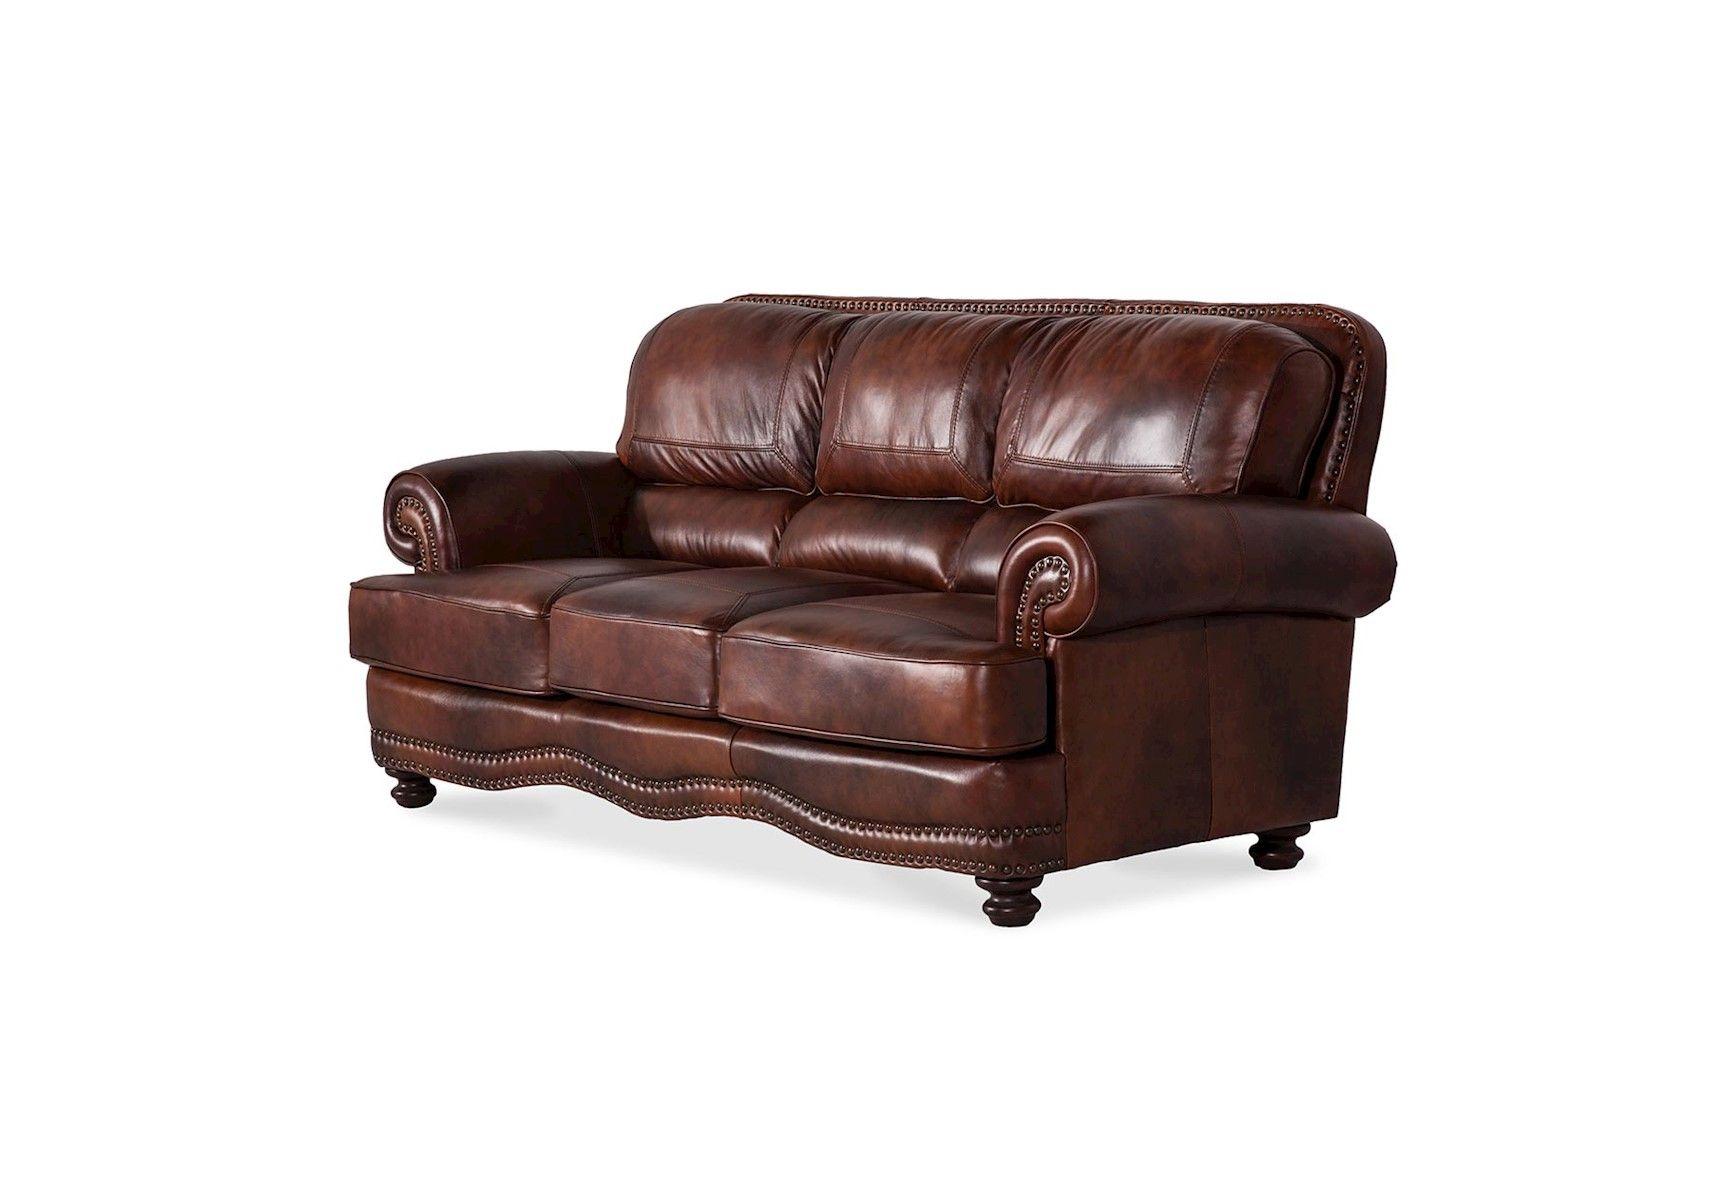 Lacks Cowboy Leather Sofa